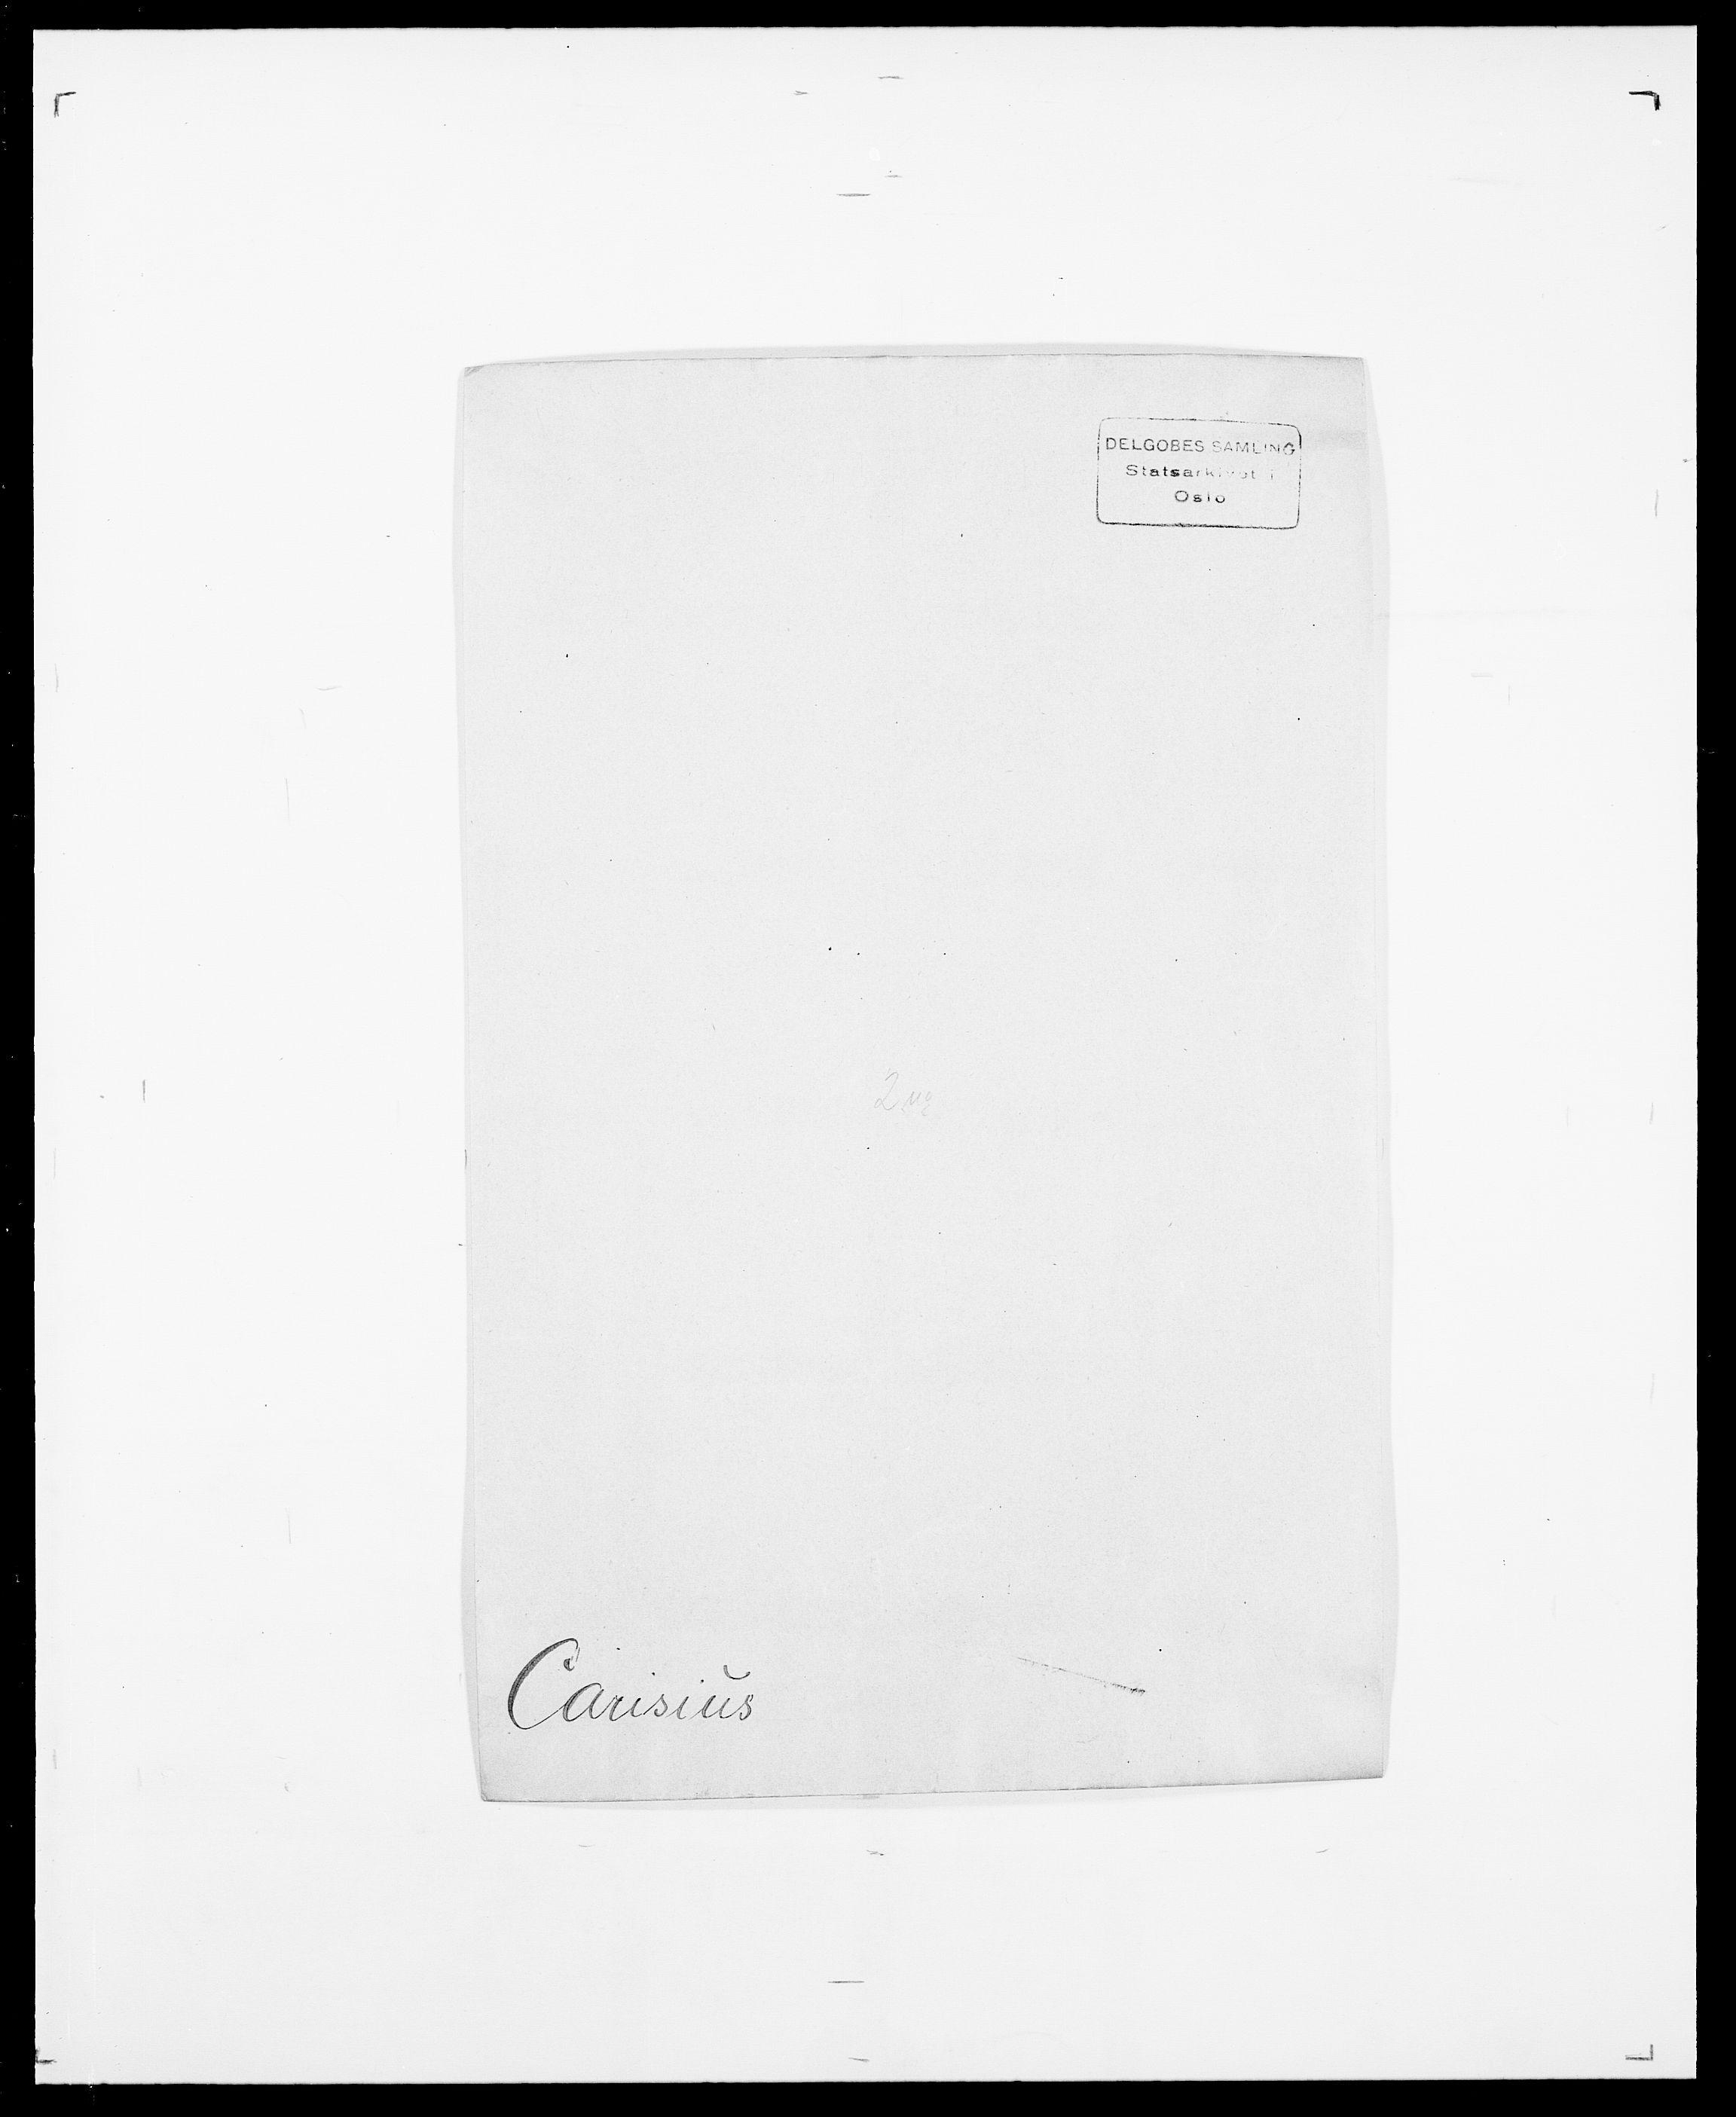 SAO, Delgobe, Charles Antoine - samling, D/Da/L0008: Capjon - Dagenbolt, s. 35